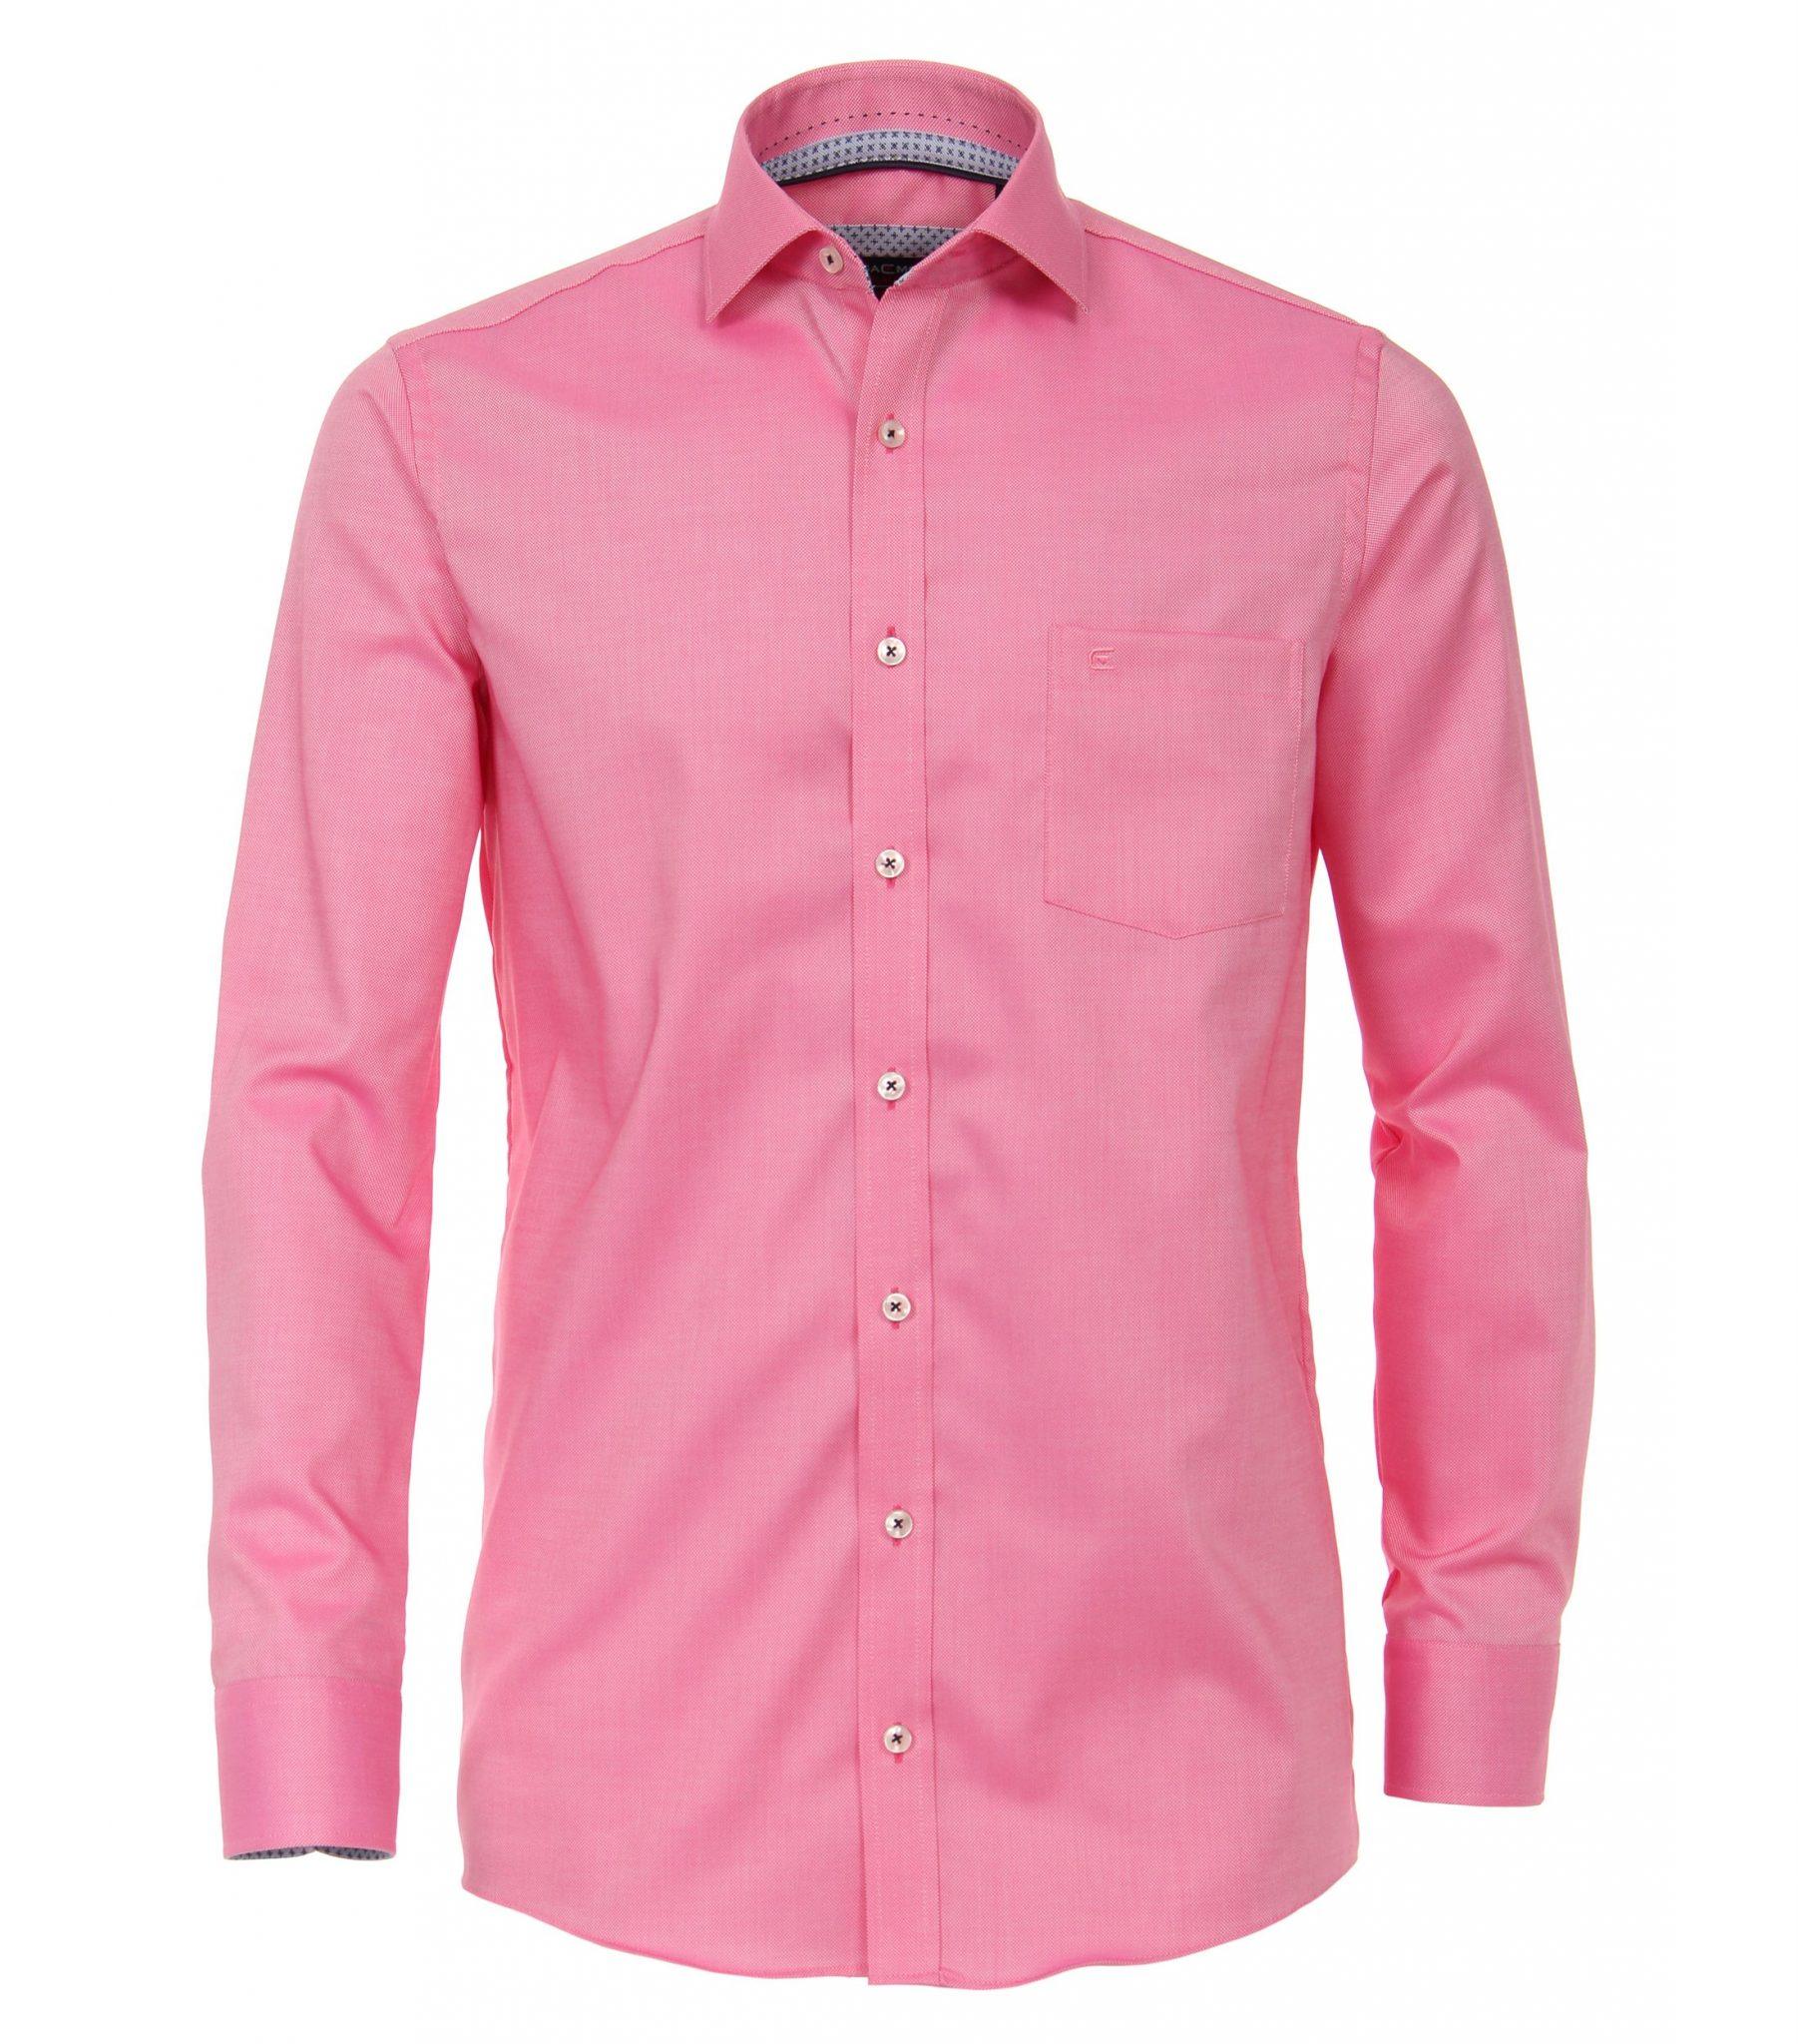 Overhemd Extra Mouwlengte.Casa Moda Overhemd Extra Lange Mouw Mouwlengte7 Roze Strijkvrij